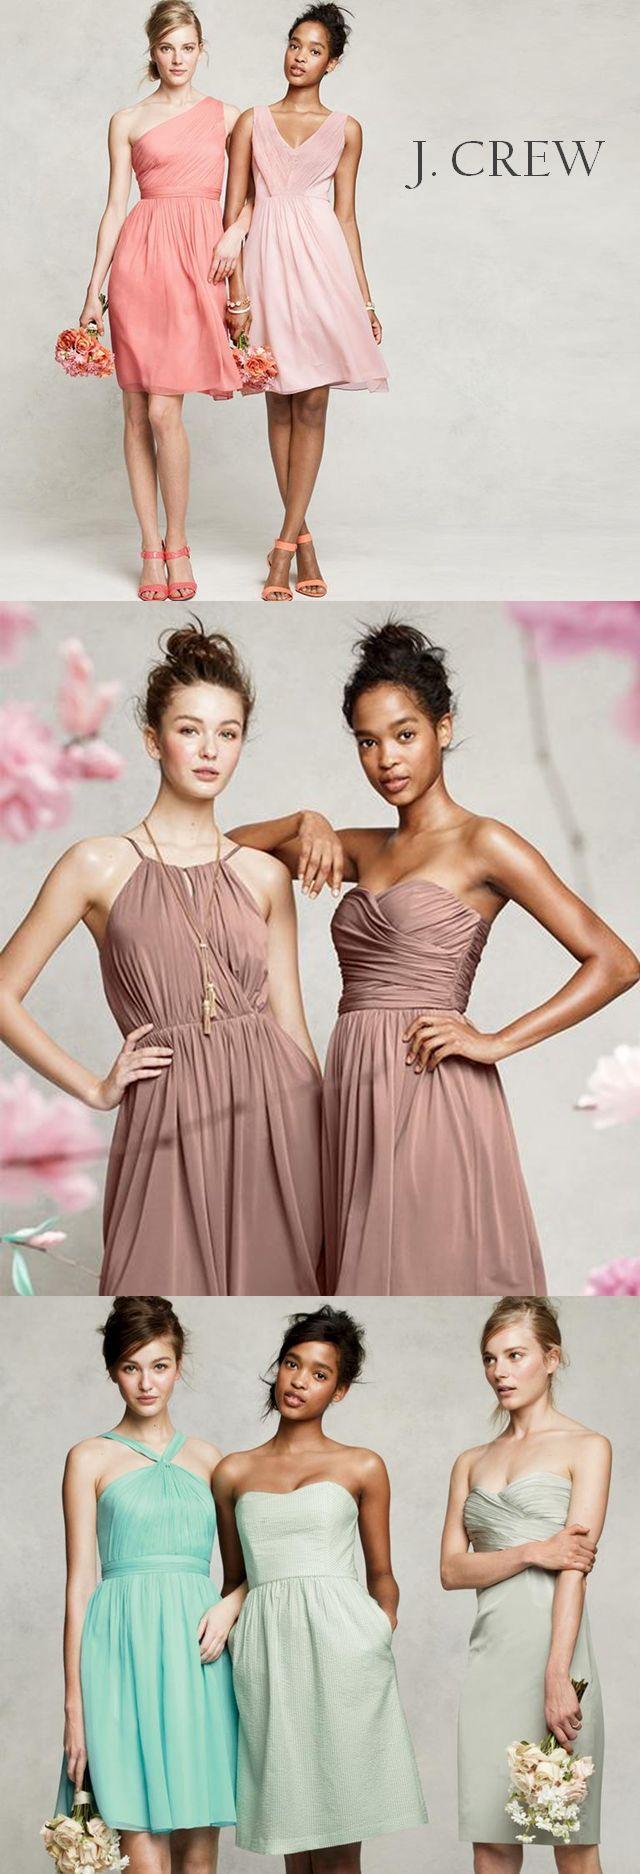 Jcrew bridesmaid dresses wedding dresses in redlands for J crew short wedding dresses